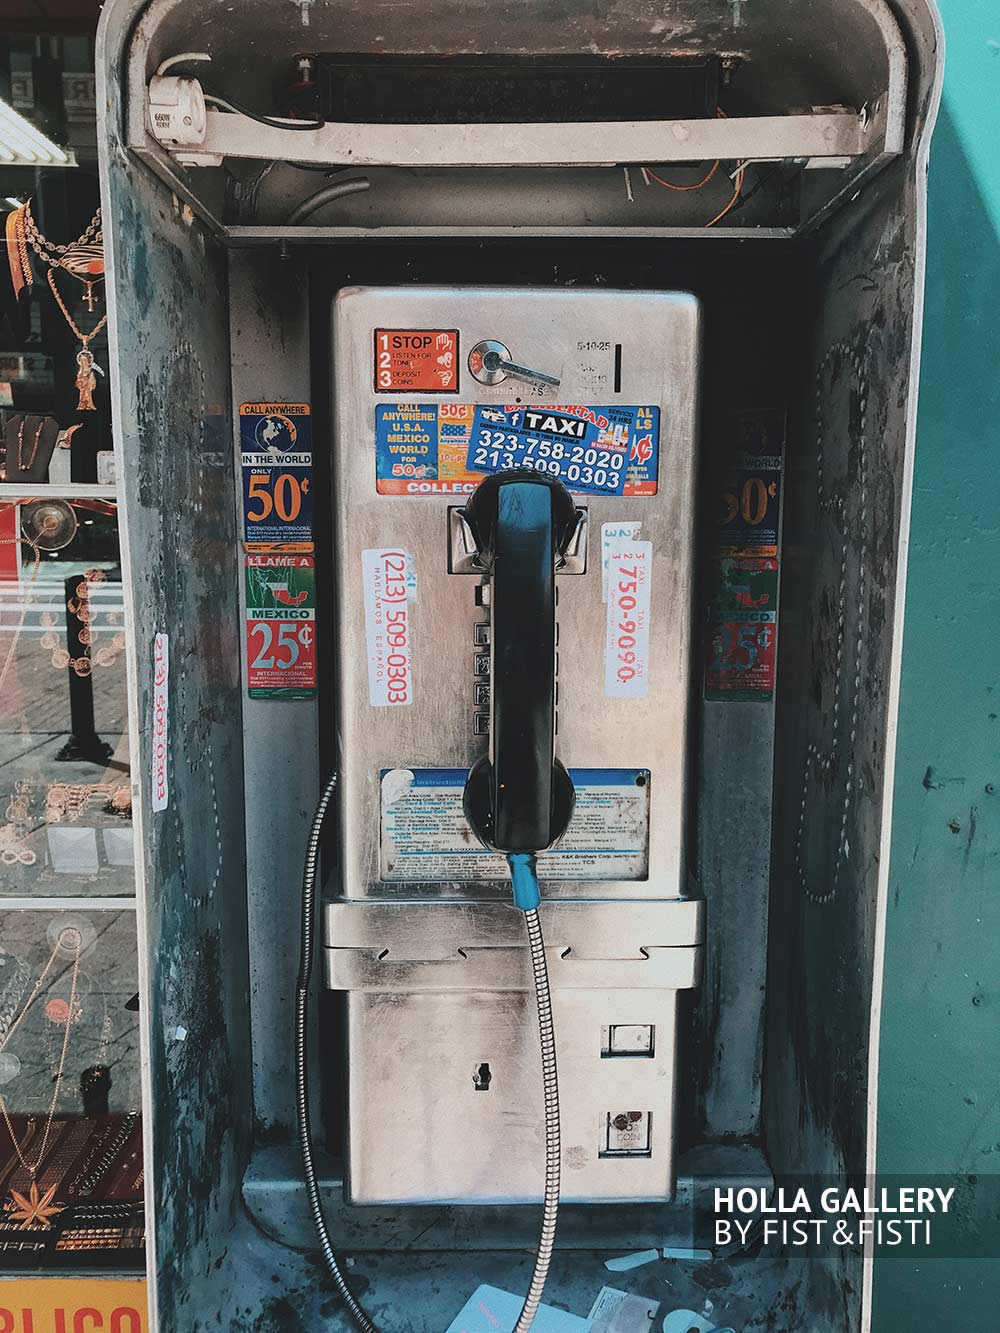 call-box, телефон, телефонная будка, Нью-Йорк